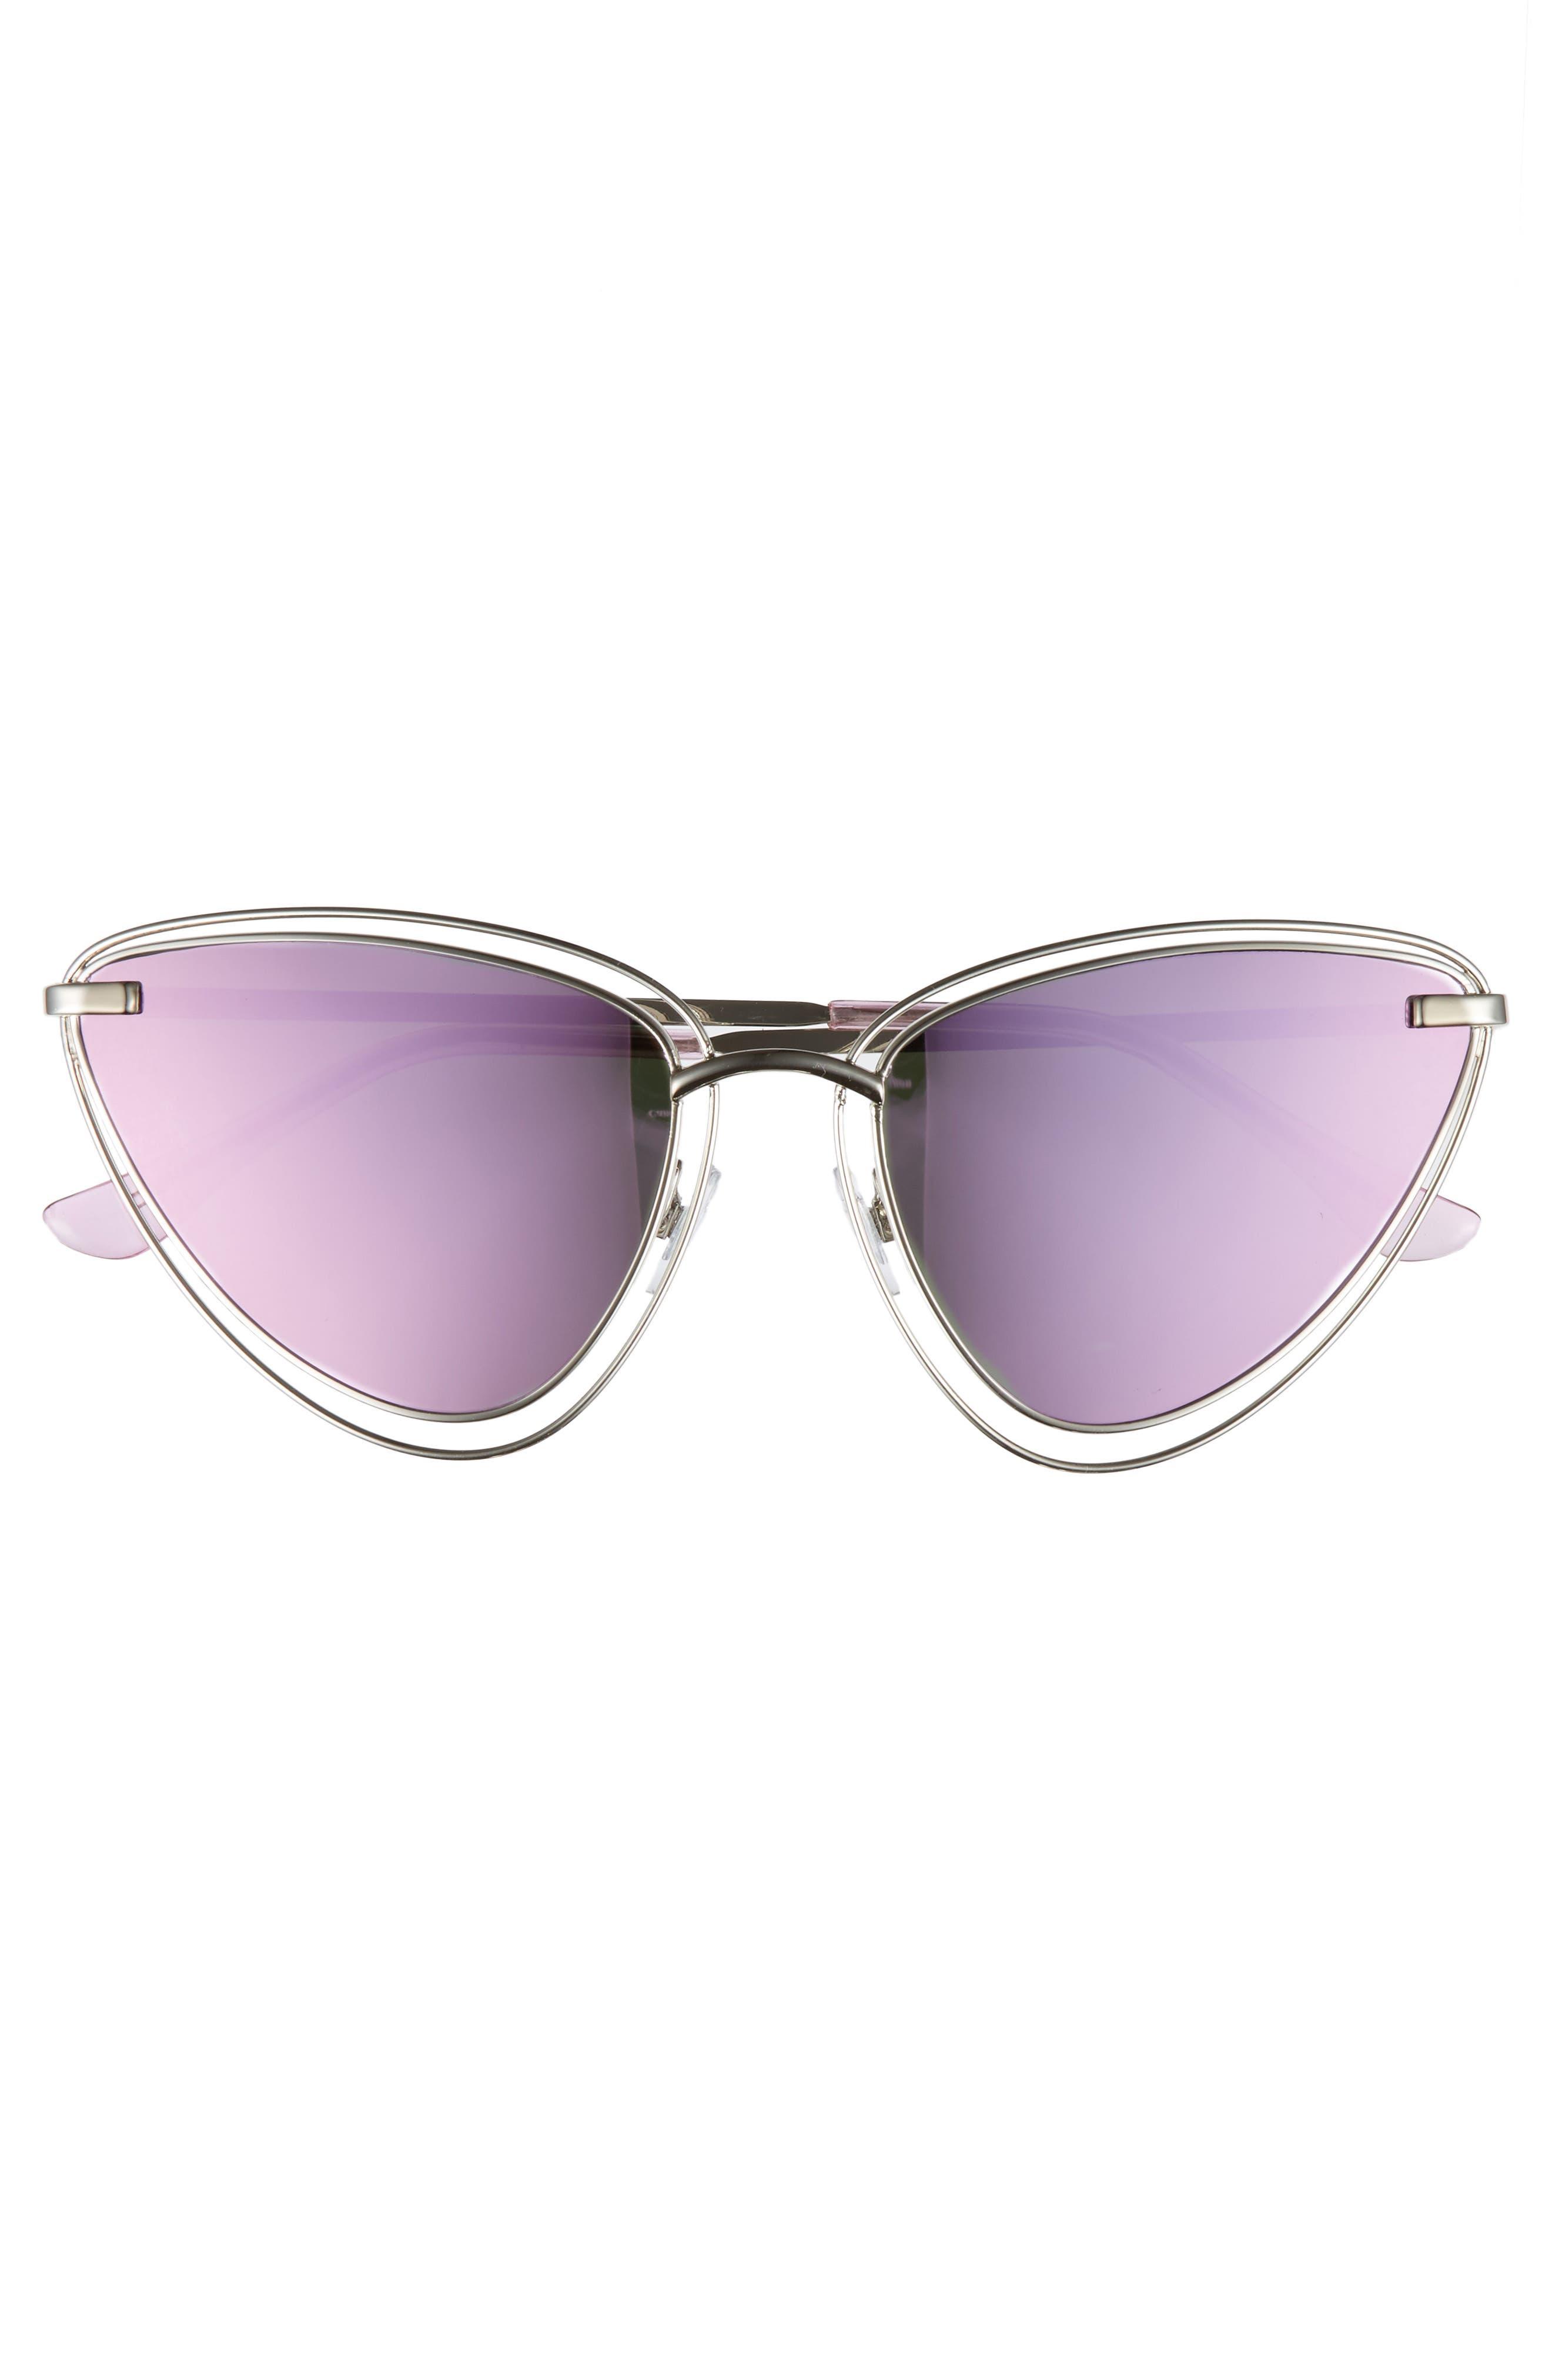 55mm Metal Cat Eye Sunglasses,                             Alternate thumbnail 3, color,                             040